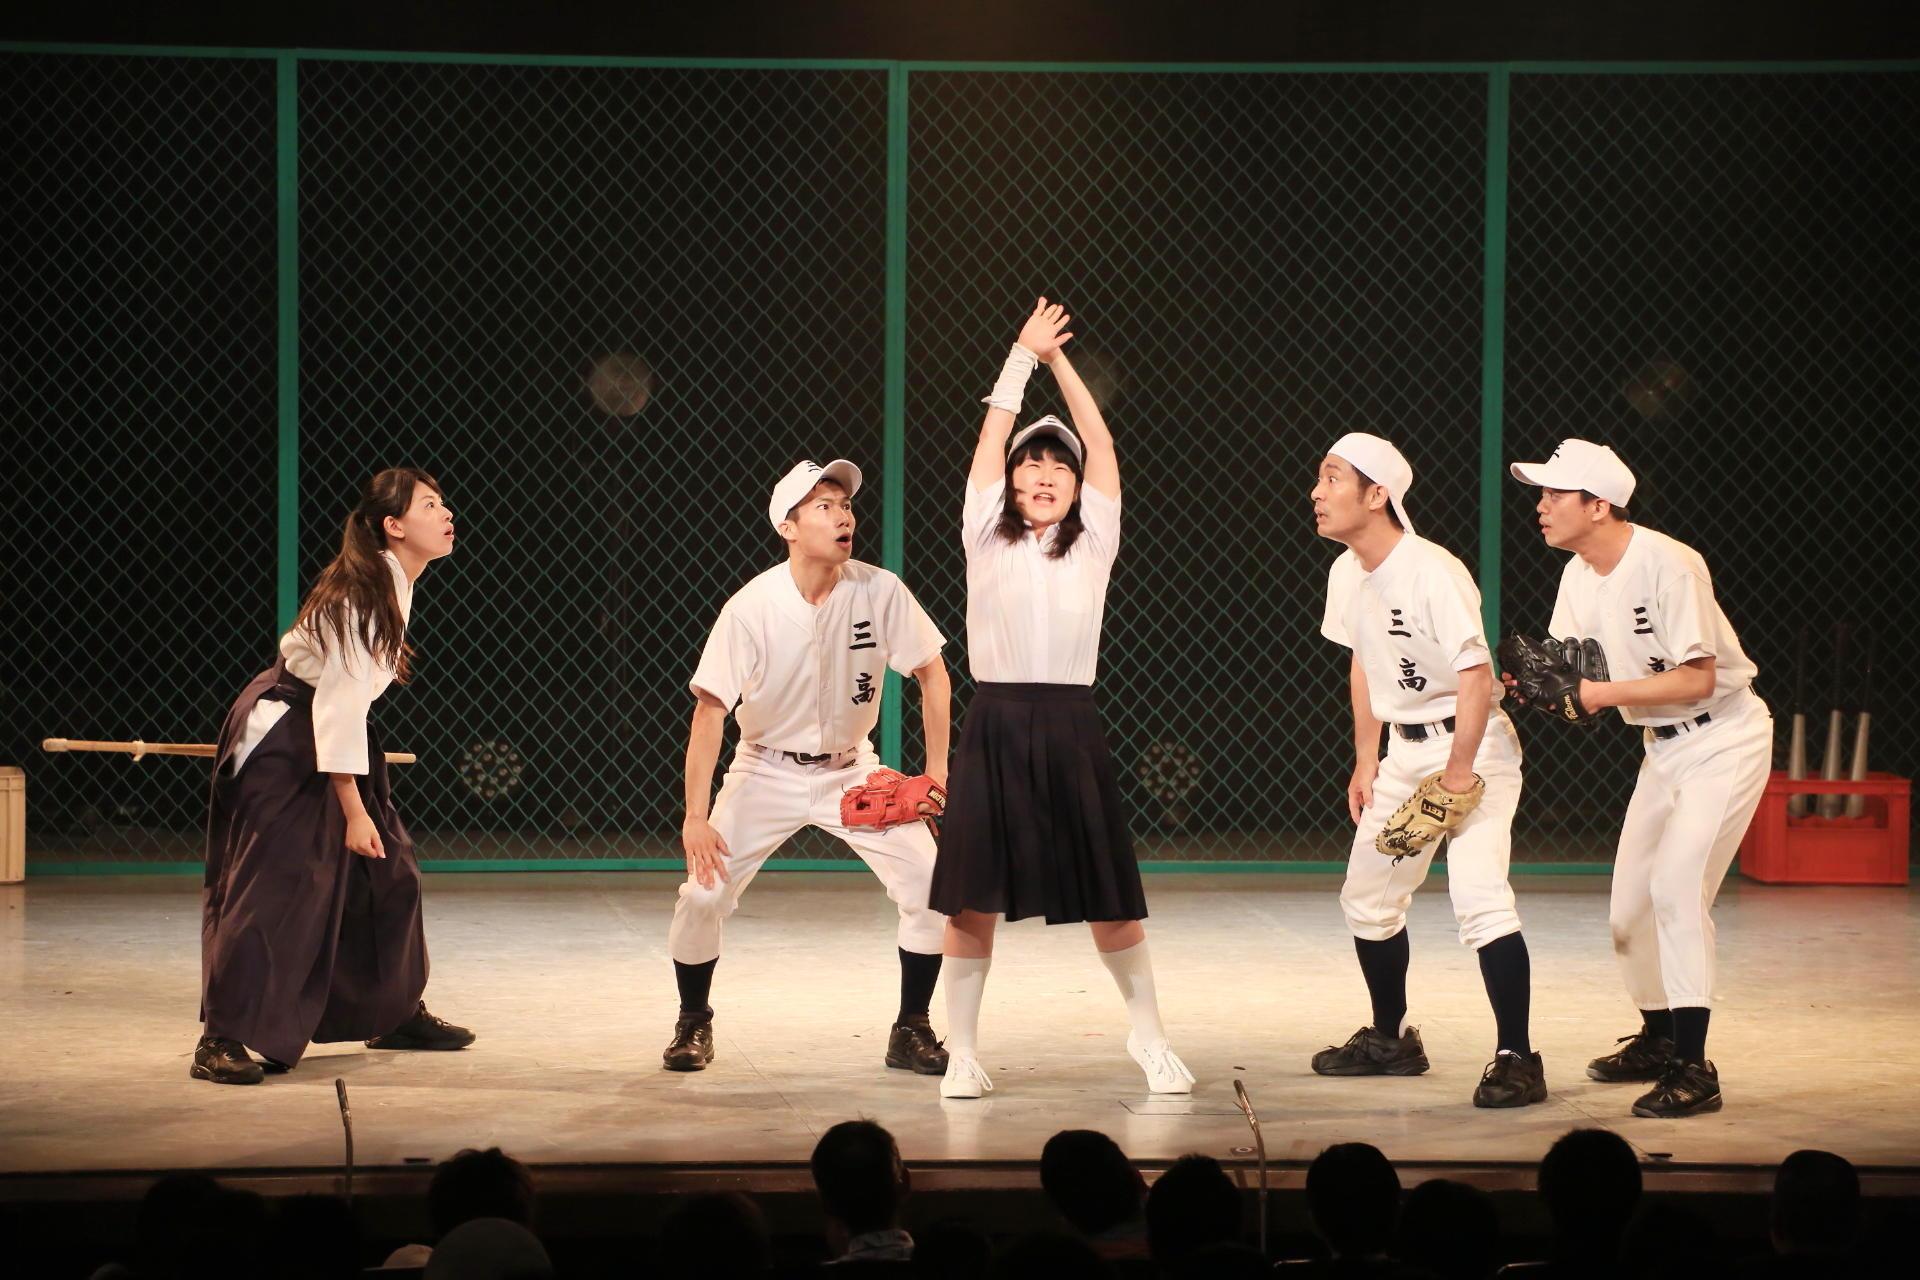 http://news.yoshimoto.co.jp/20170713181050-2c8cf144fc4631f6fa46a28faf484f5b3ba319d7.jpg